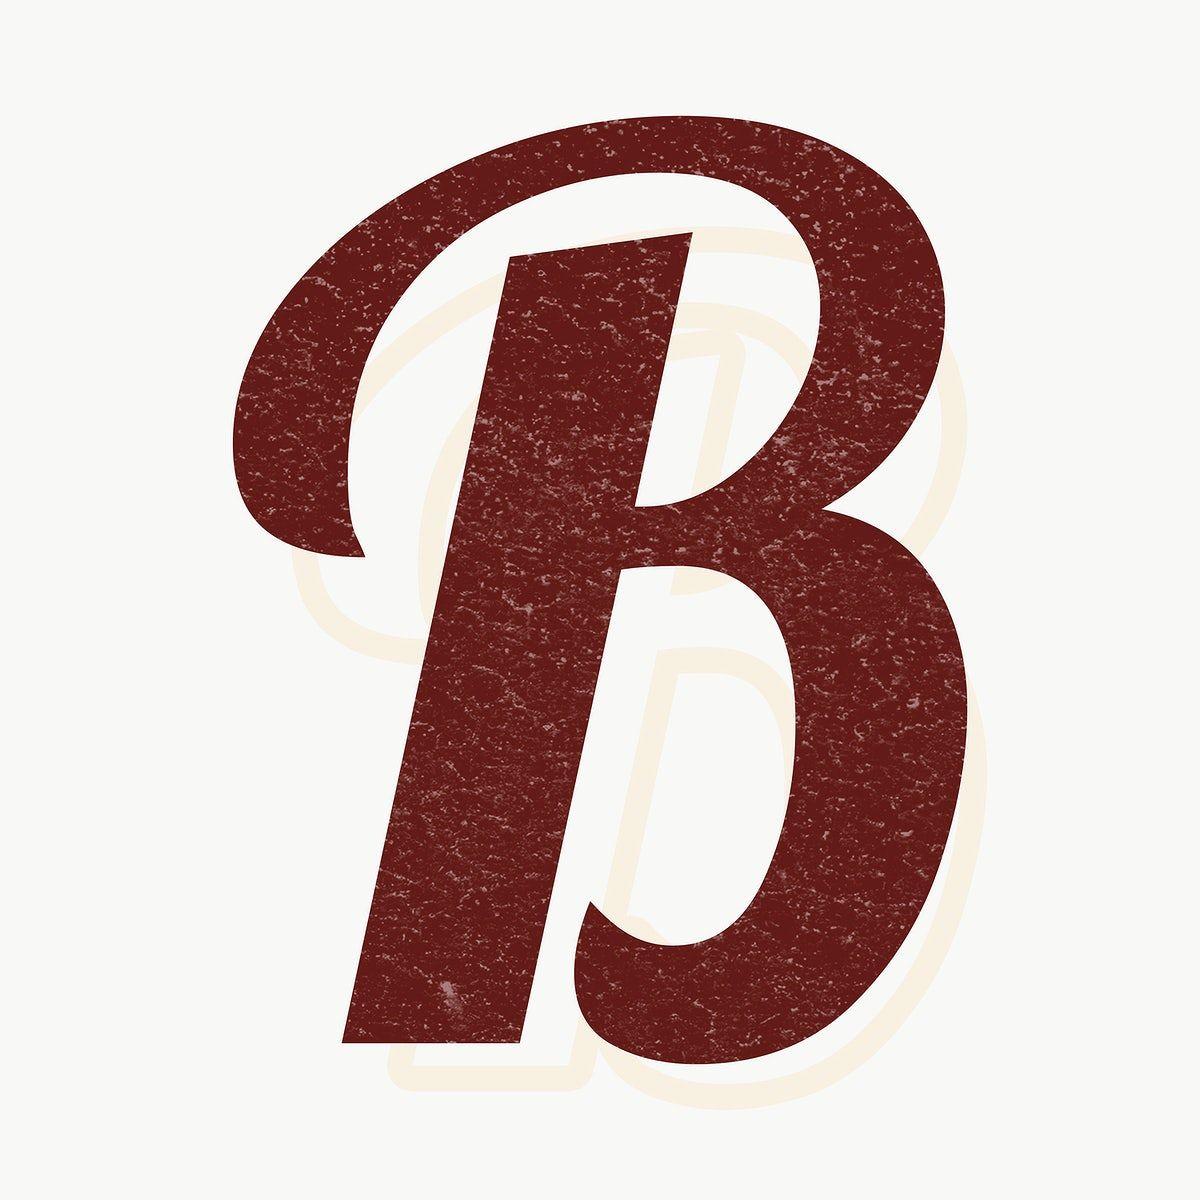 Alphabet Letter B Vintage Handwriting Cursive Font Png With Transparent Background Free Image By Cursive Fonts Handwritten Cursive Fonts Cursive Handwriting